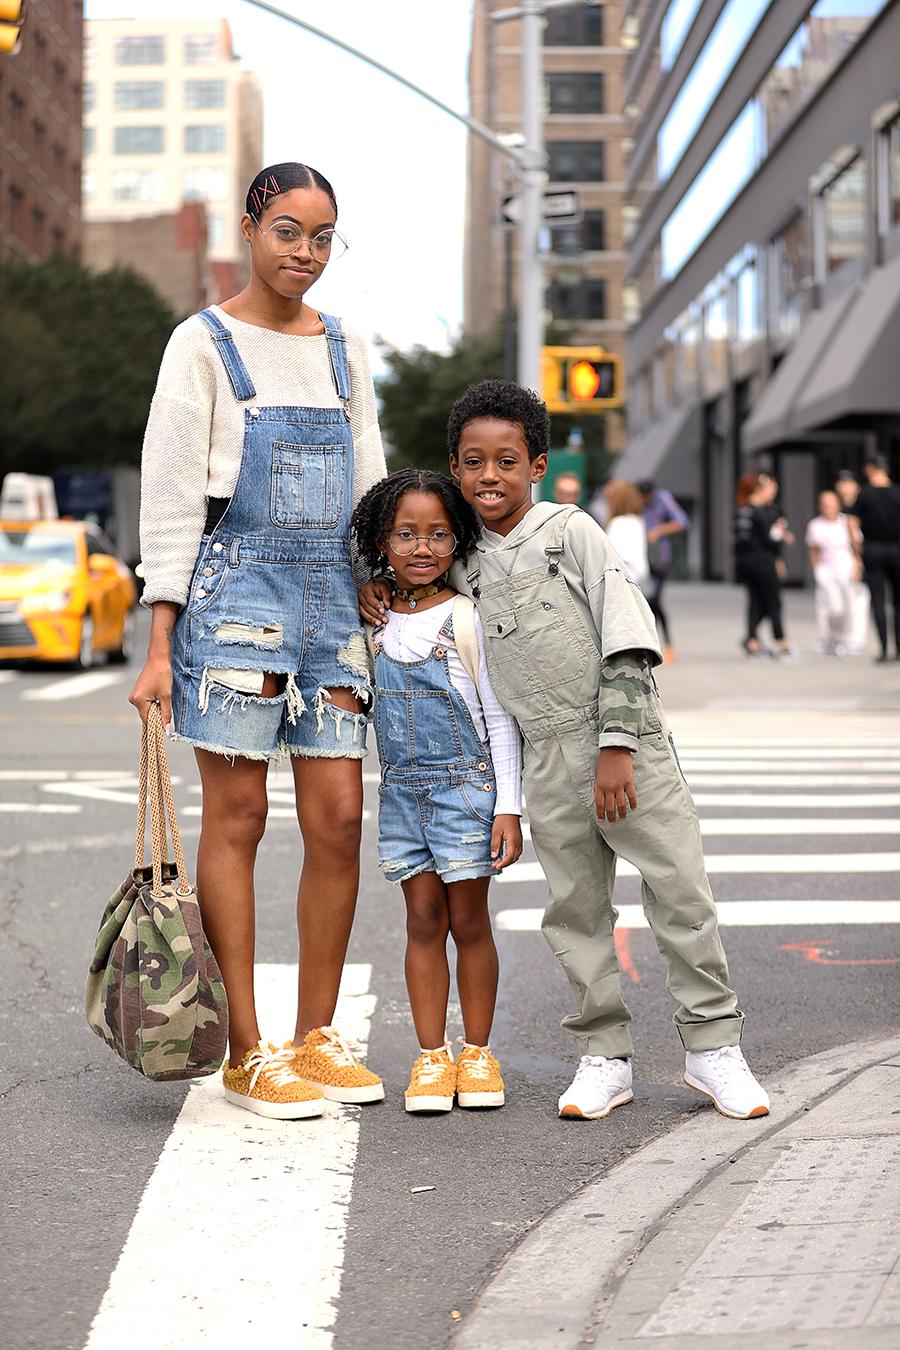 Cory_Fader_street_fashion_photography_NYC_Tony_Ward_Studio_fashionalble_mother_kids